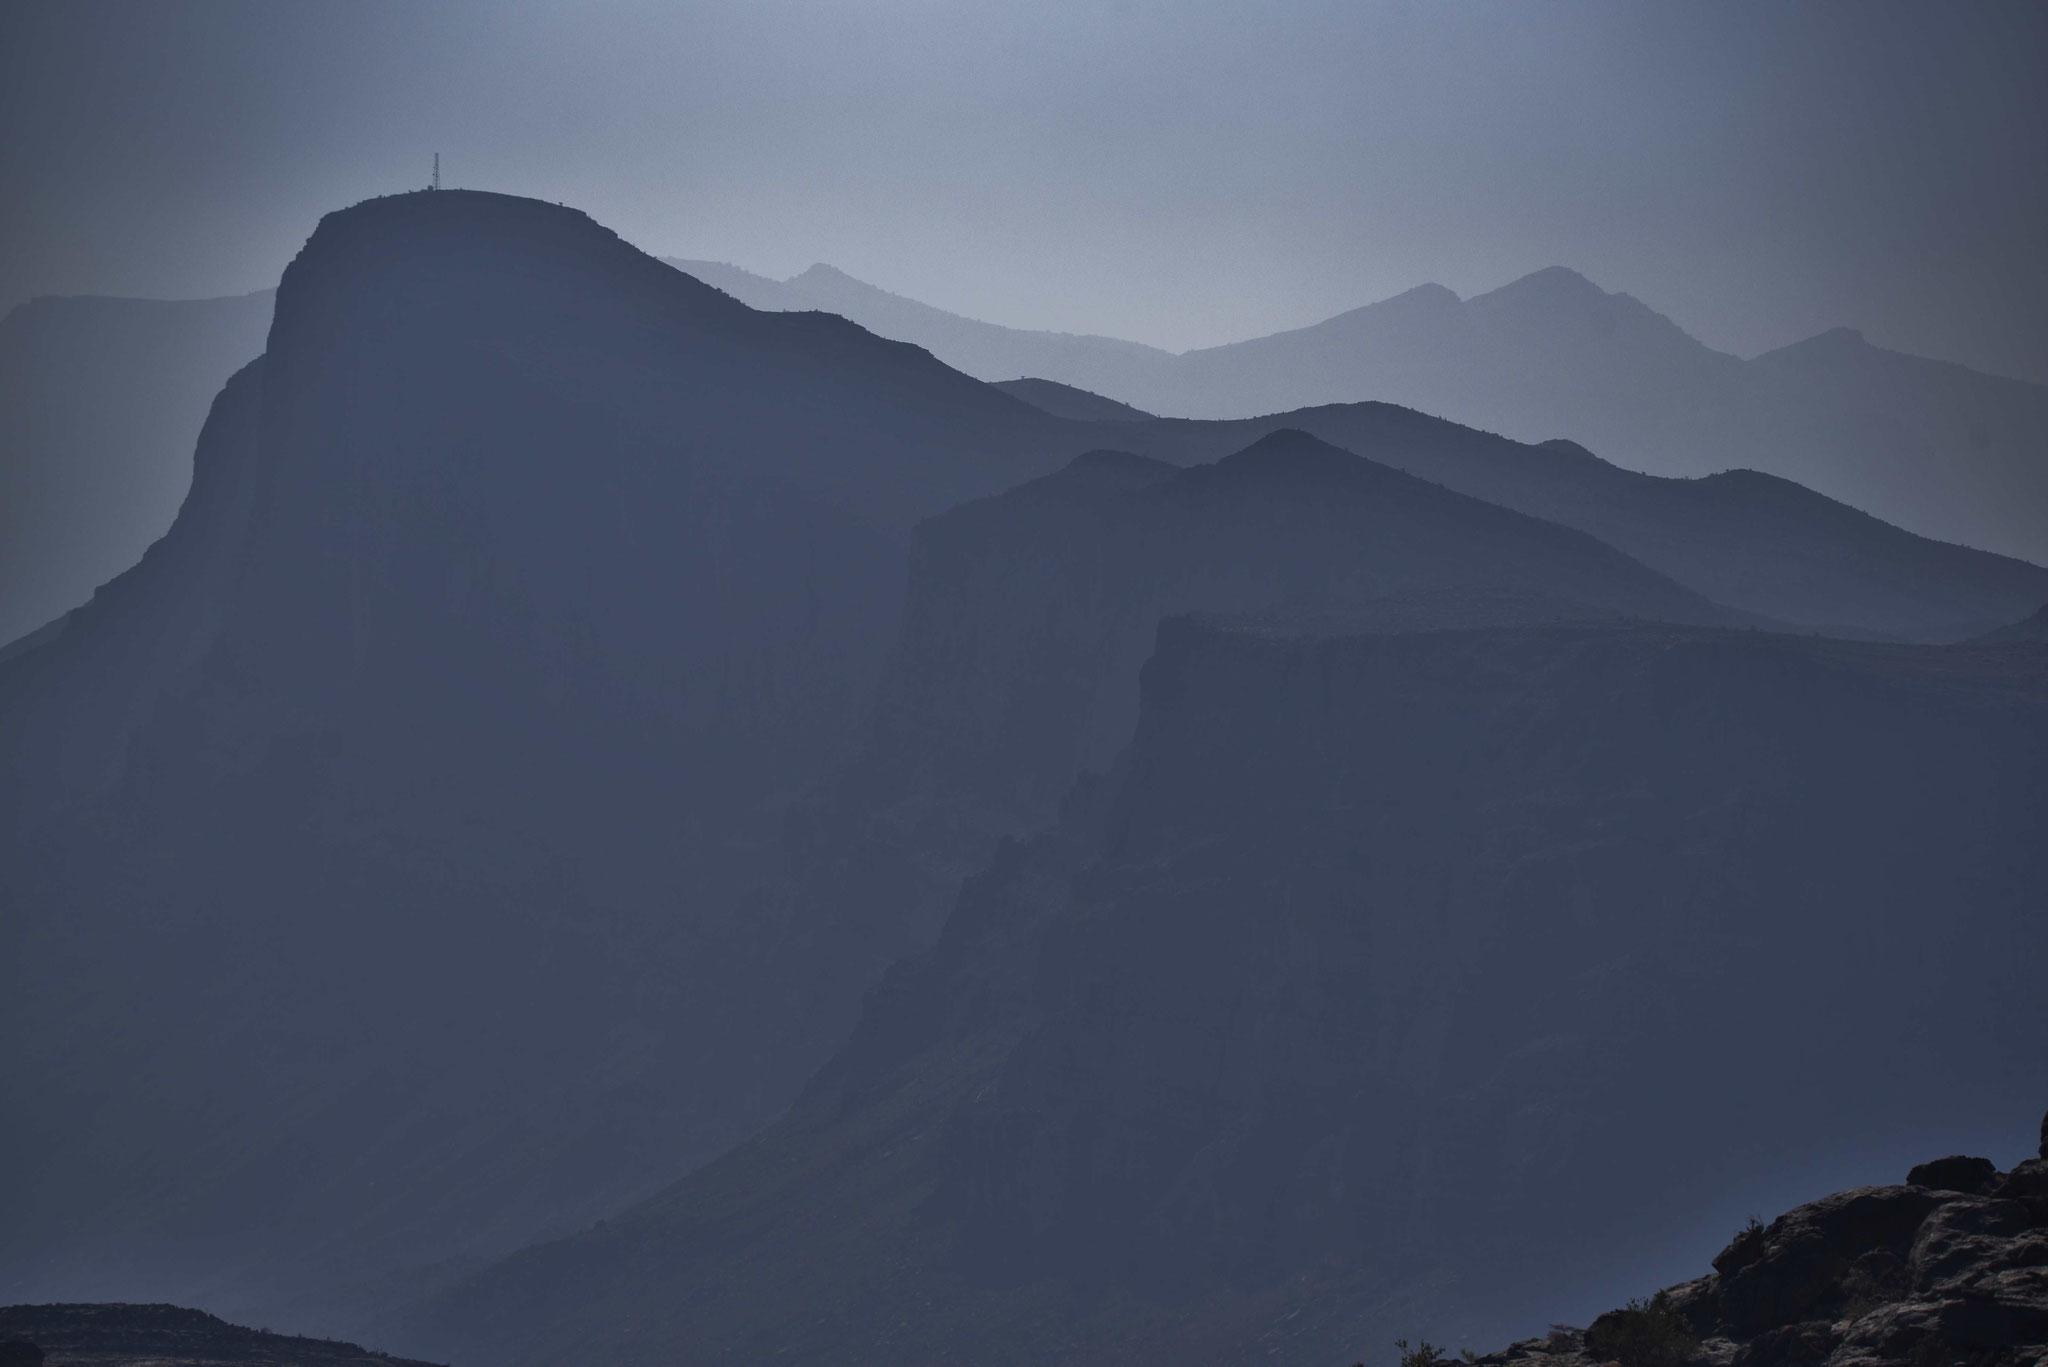 Blick auf die Berge um den Jebel Shams